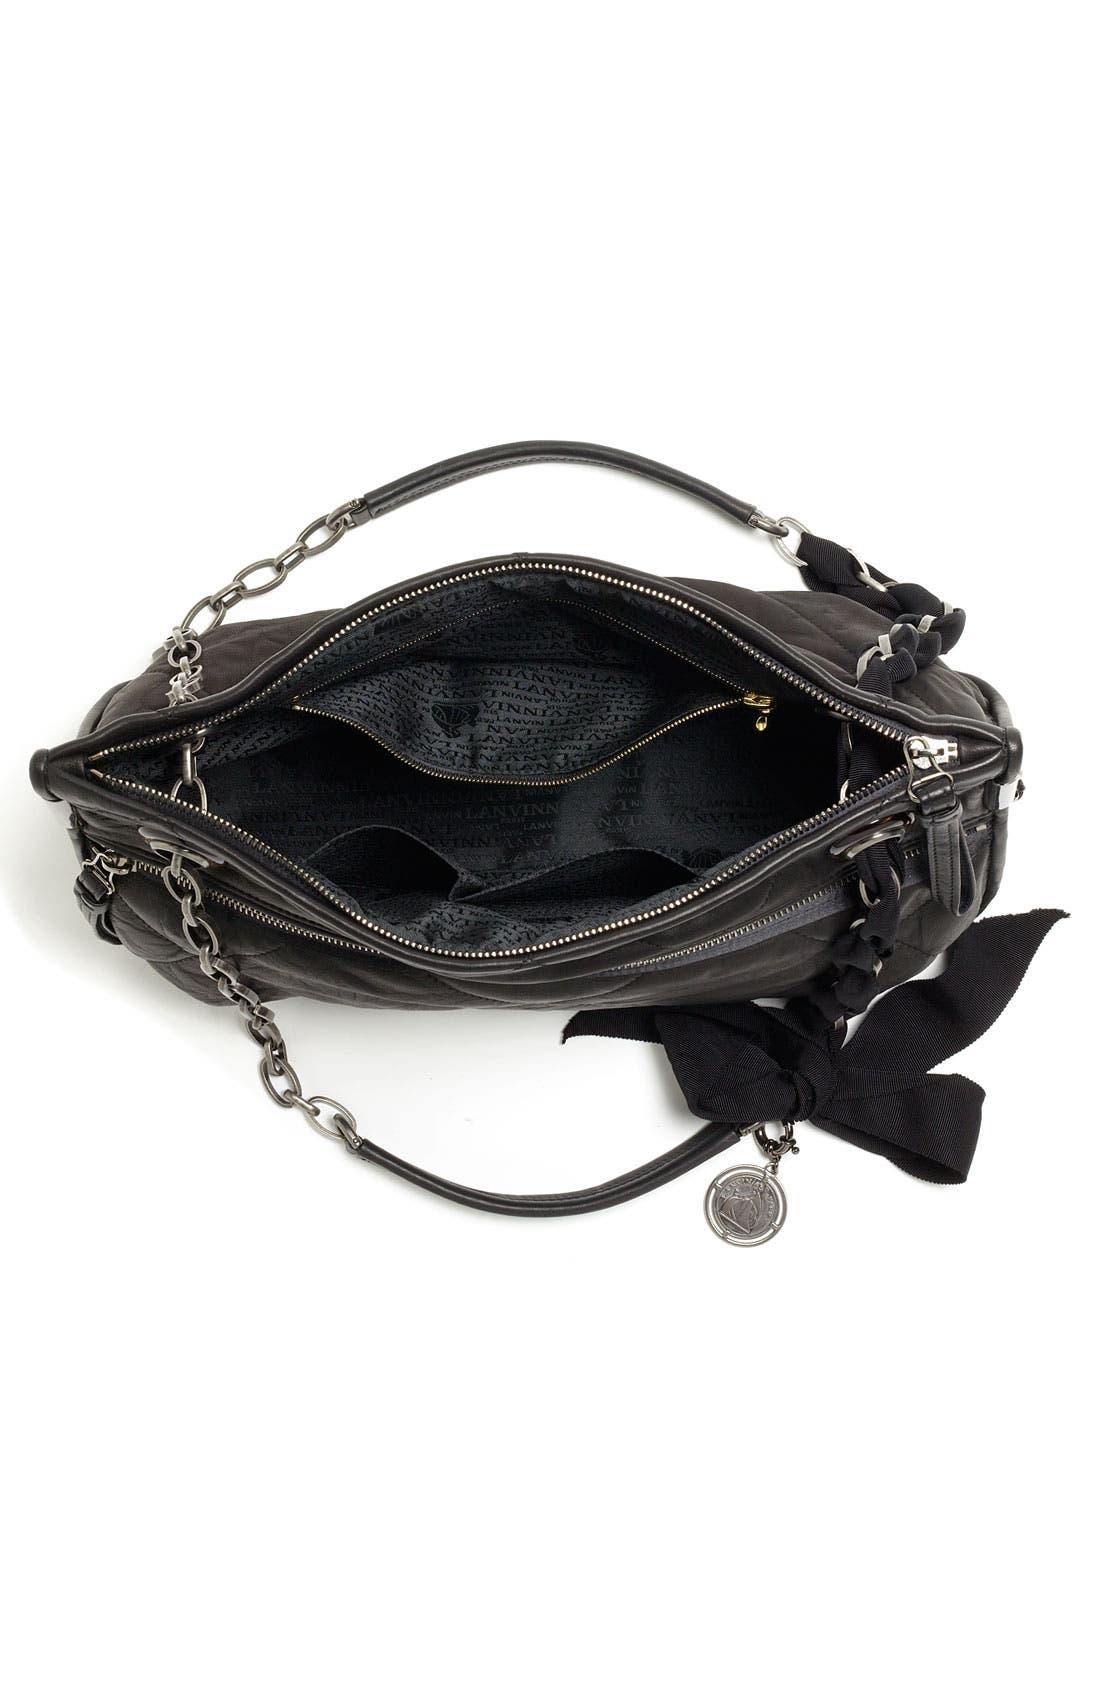 LANVIN, 'Amalia - Medium' Leather Shoulder Bag, Alternate thumbnail 3, color, 001